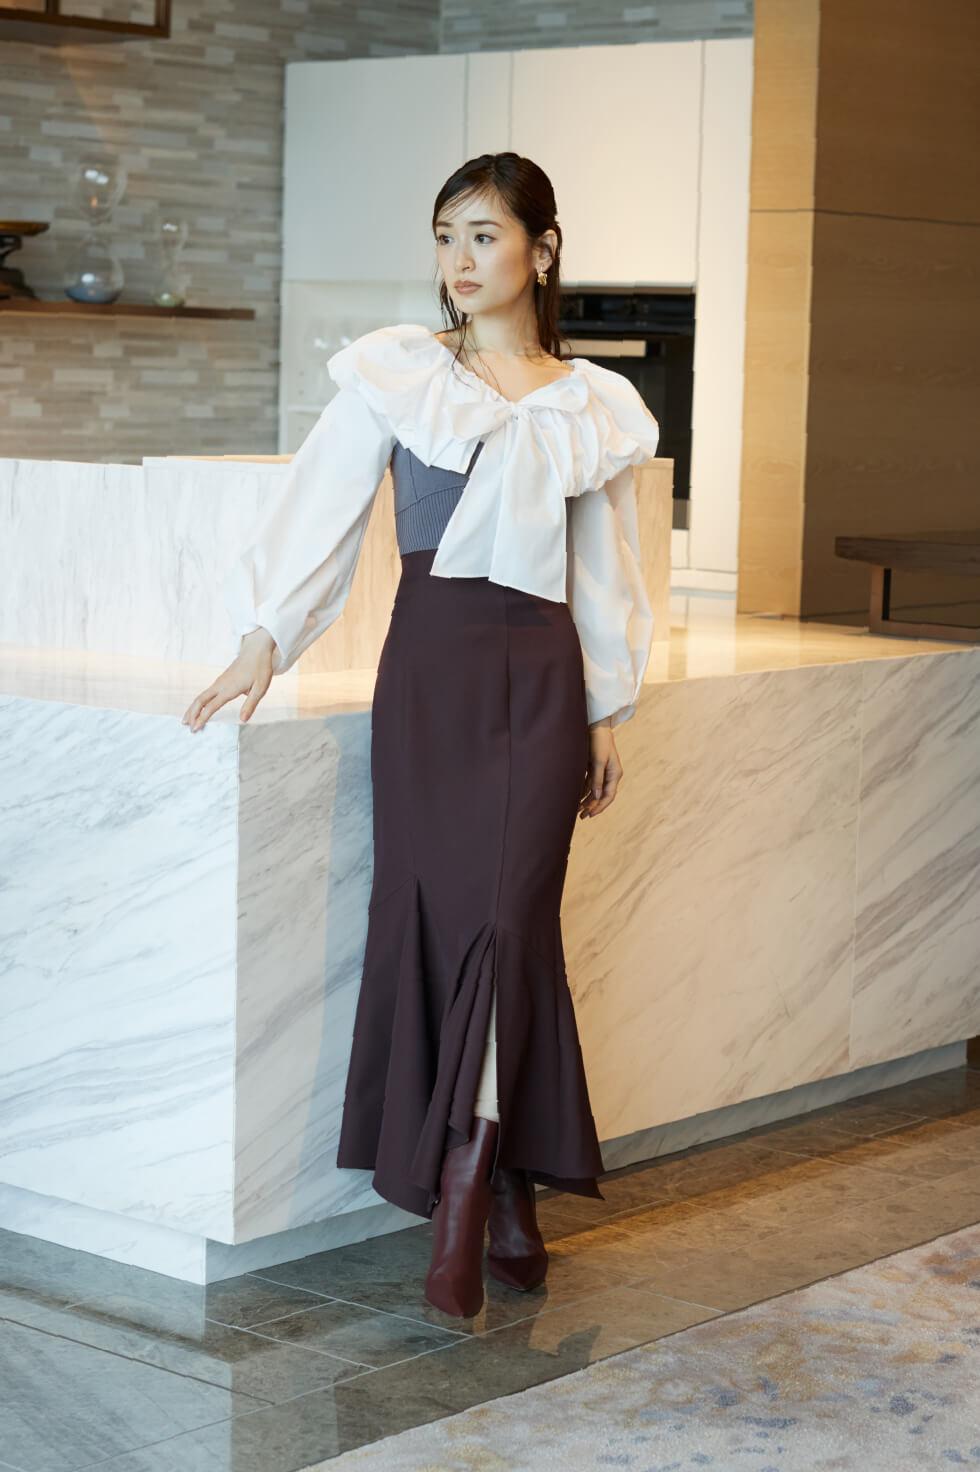 model Rika Izumi